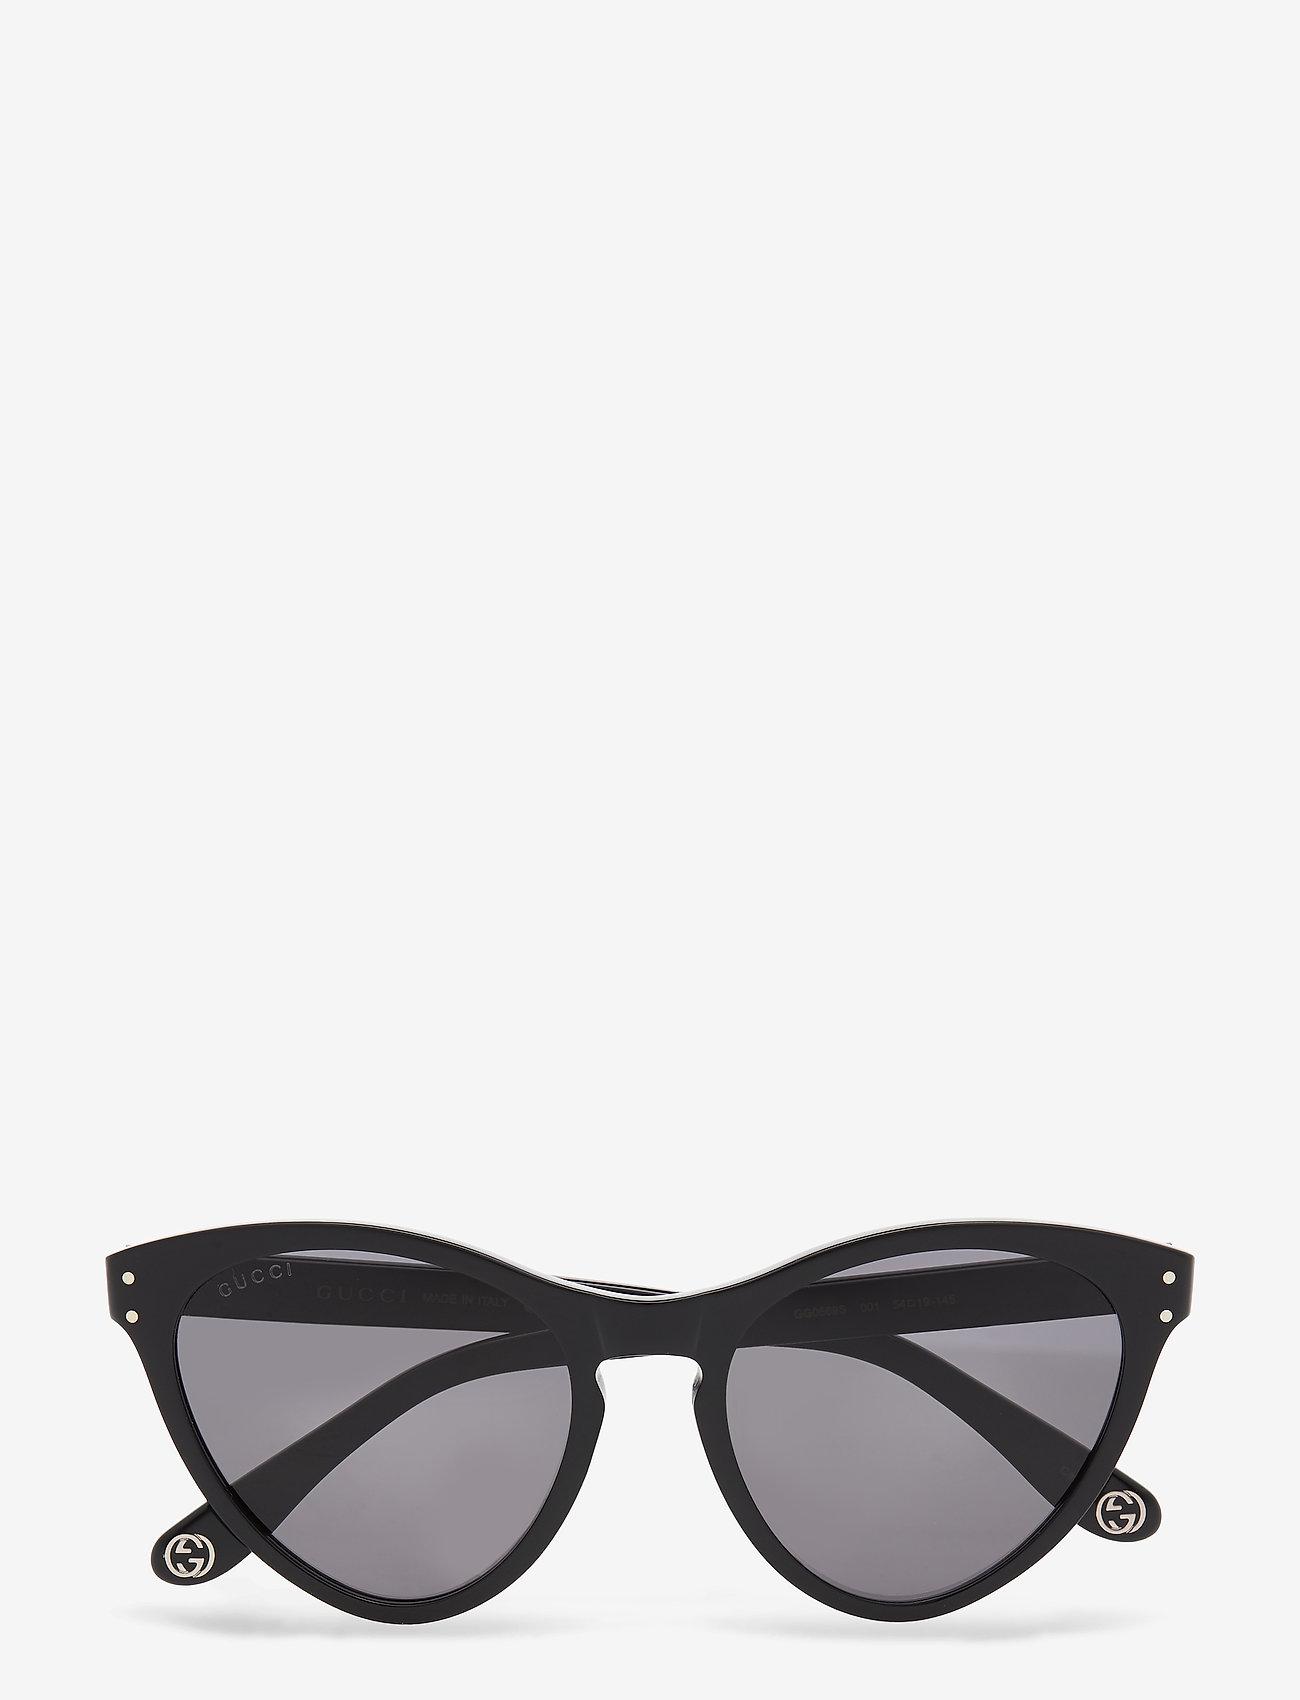 Gucci Sunglasses - GG0569S - cat-eye - black-black-grey - 0